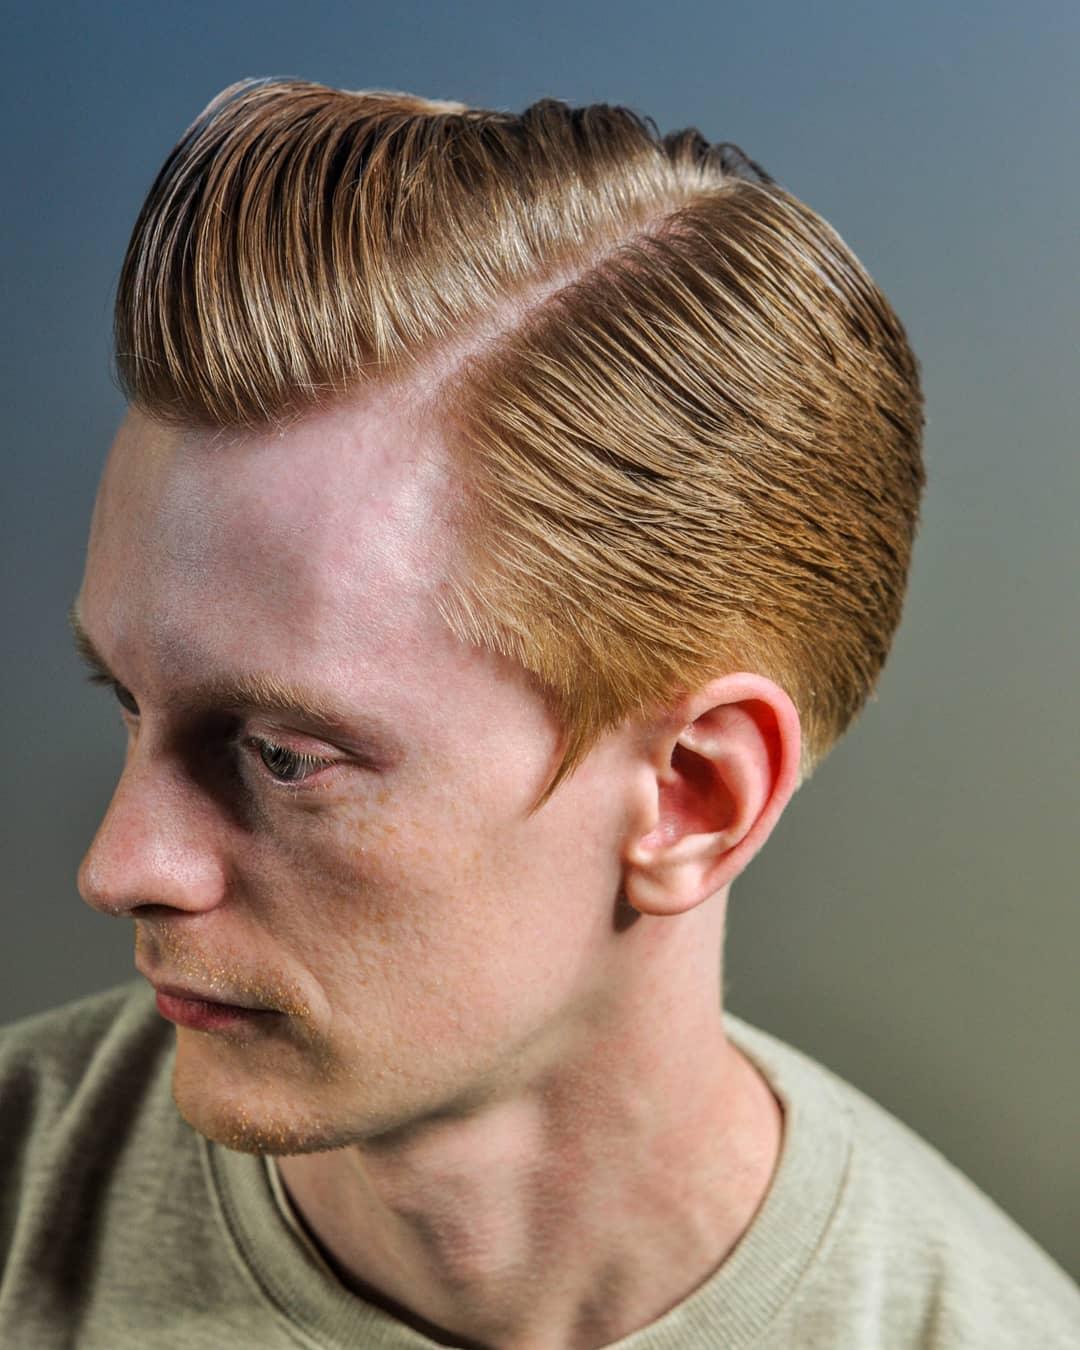 Мужская стрижка с пробором и волосами набок